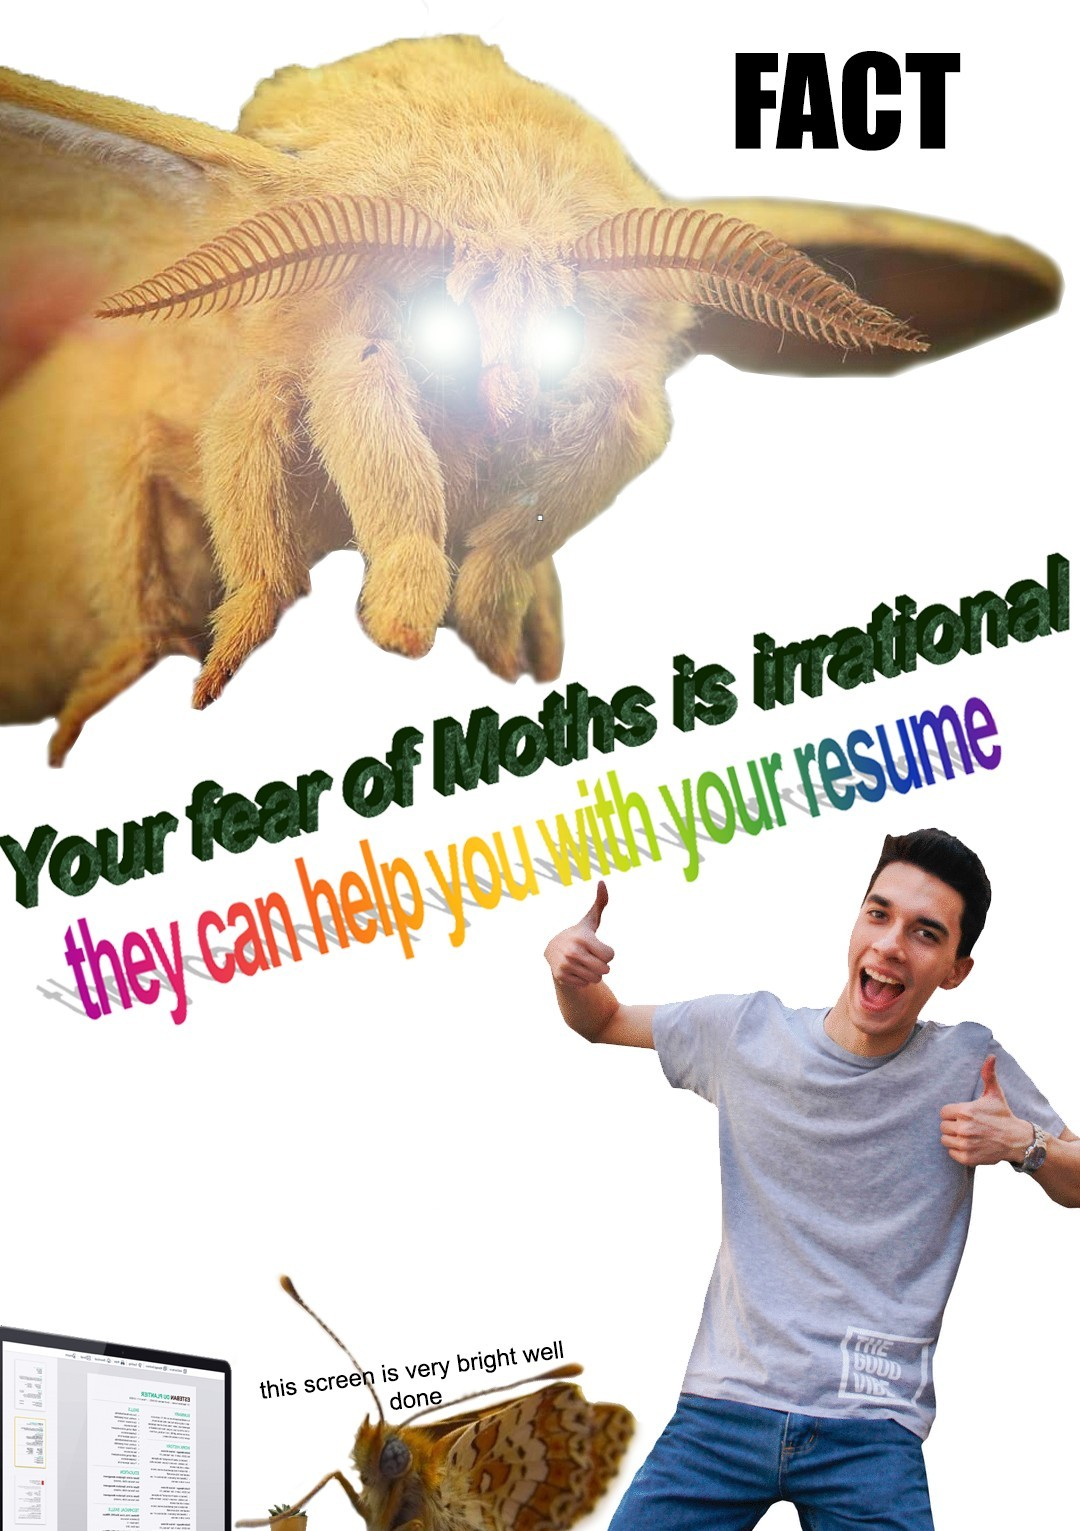 Surreal - meme